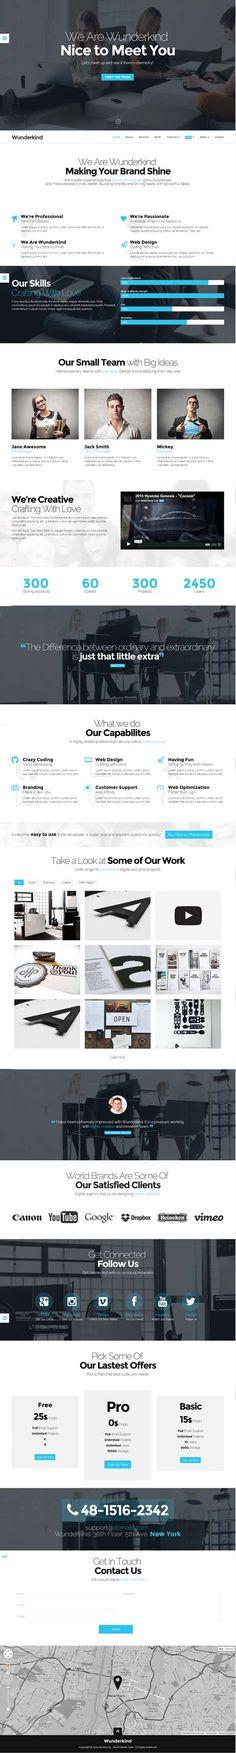 Wunderkind - One Page Parallax WordPress Theme #businesswordpressthemes #responsivedesign #wpthemes #html5 #wordpressthemes2014